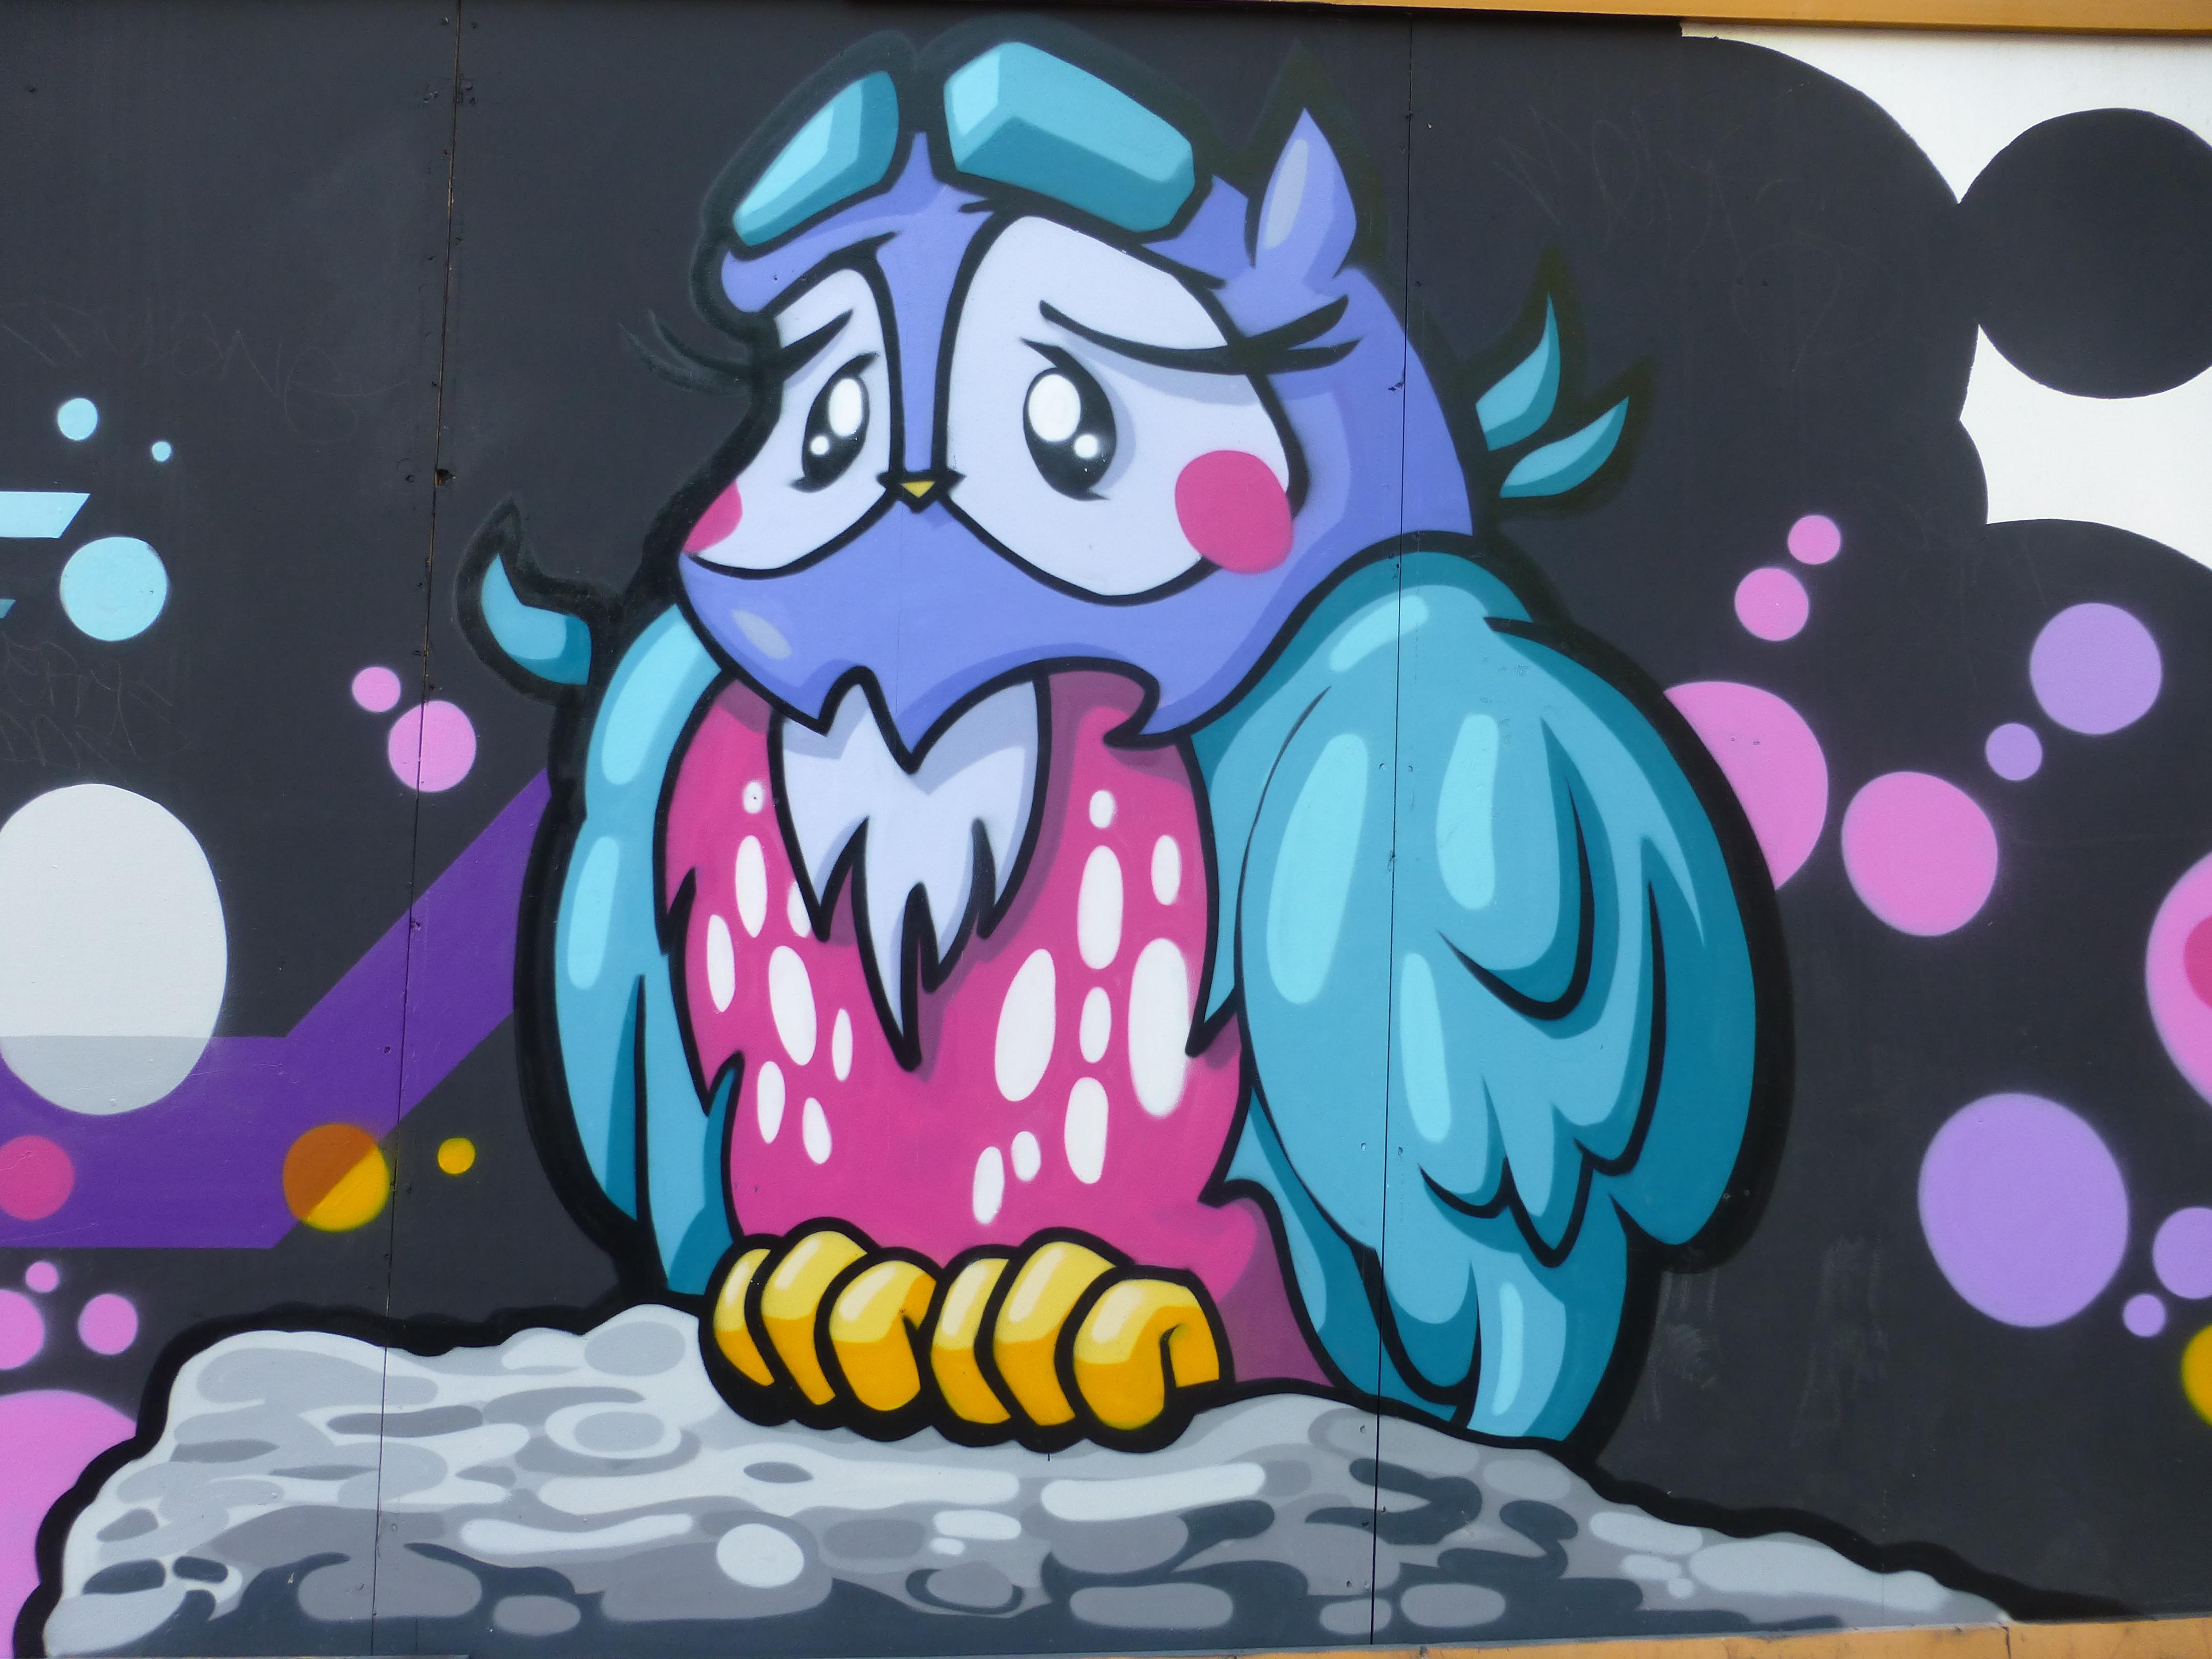 Graffiti Animation New Street Art Graffiti In Croydon August 2015 London Calling Blog